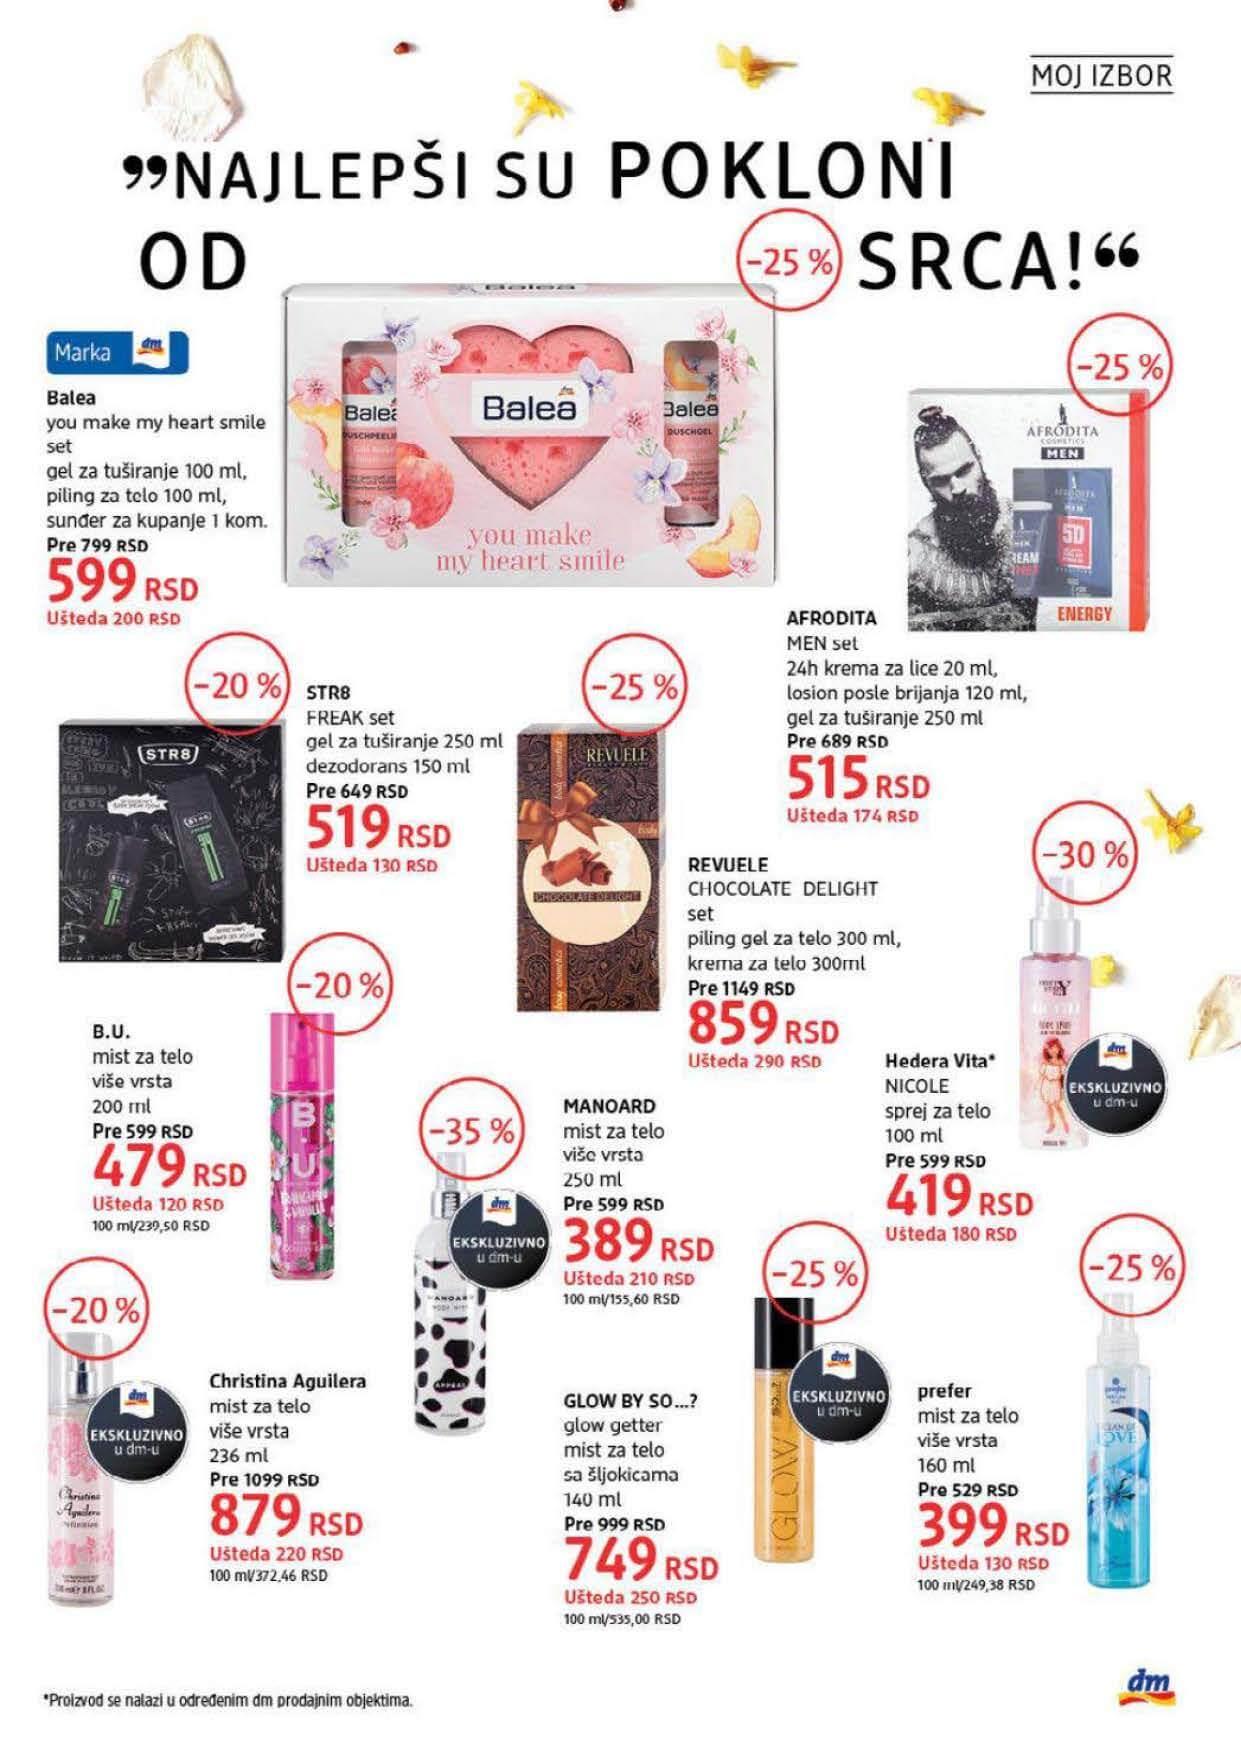 DM Katalog Srbija SEPTEMBAR 2021 1.9.2021. 30.9.2021. Page 23